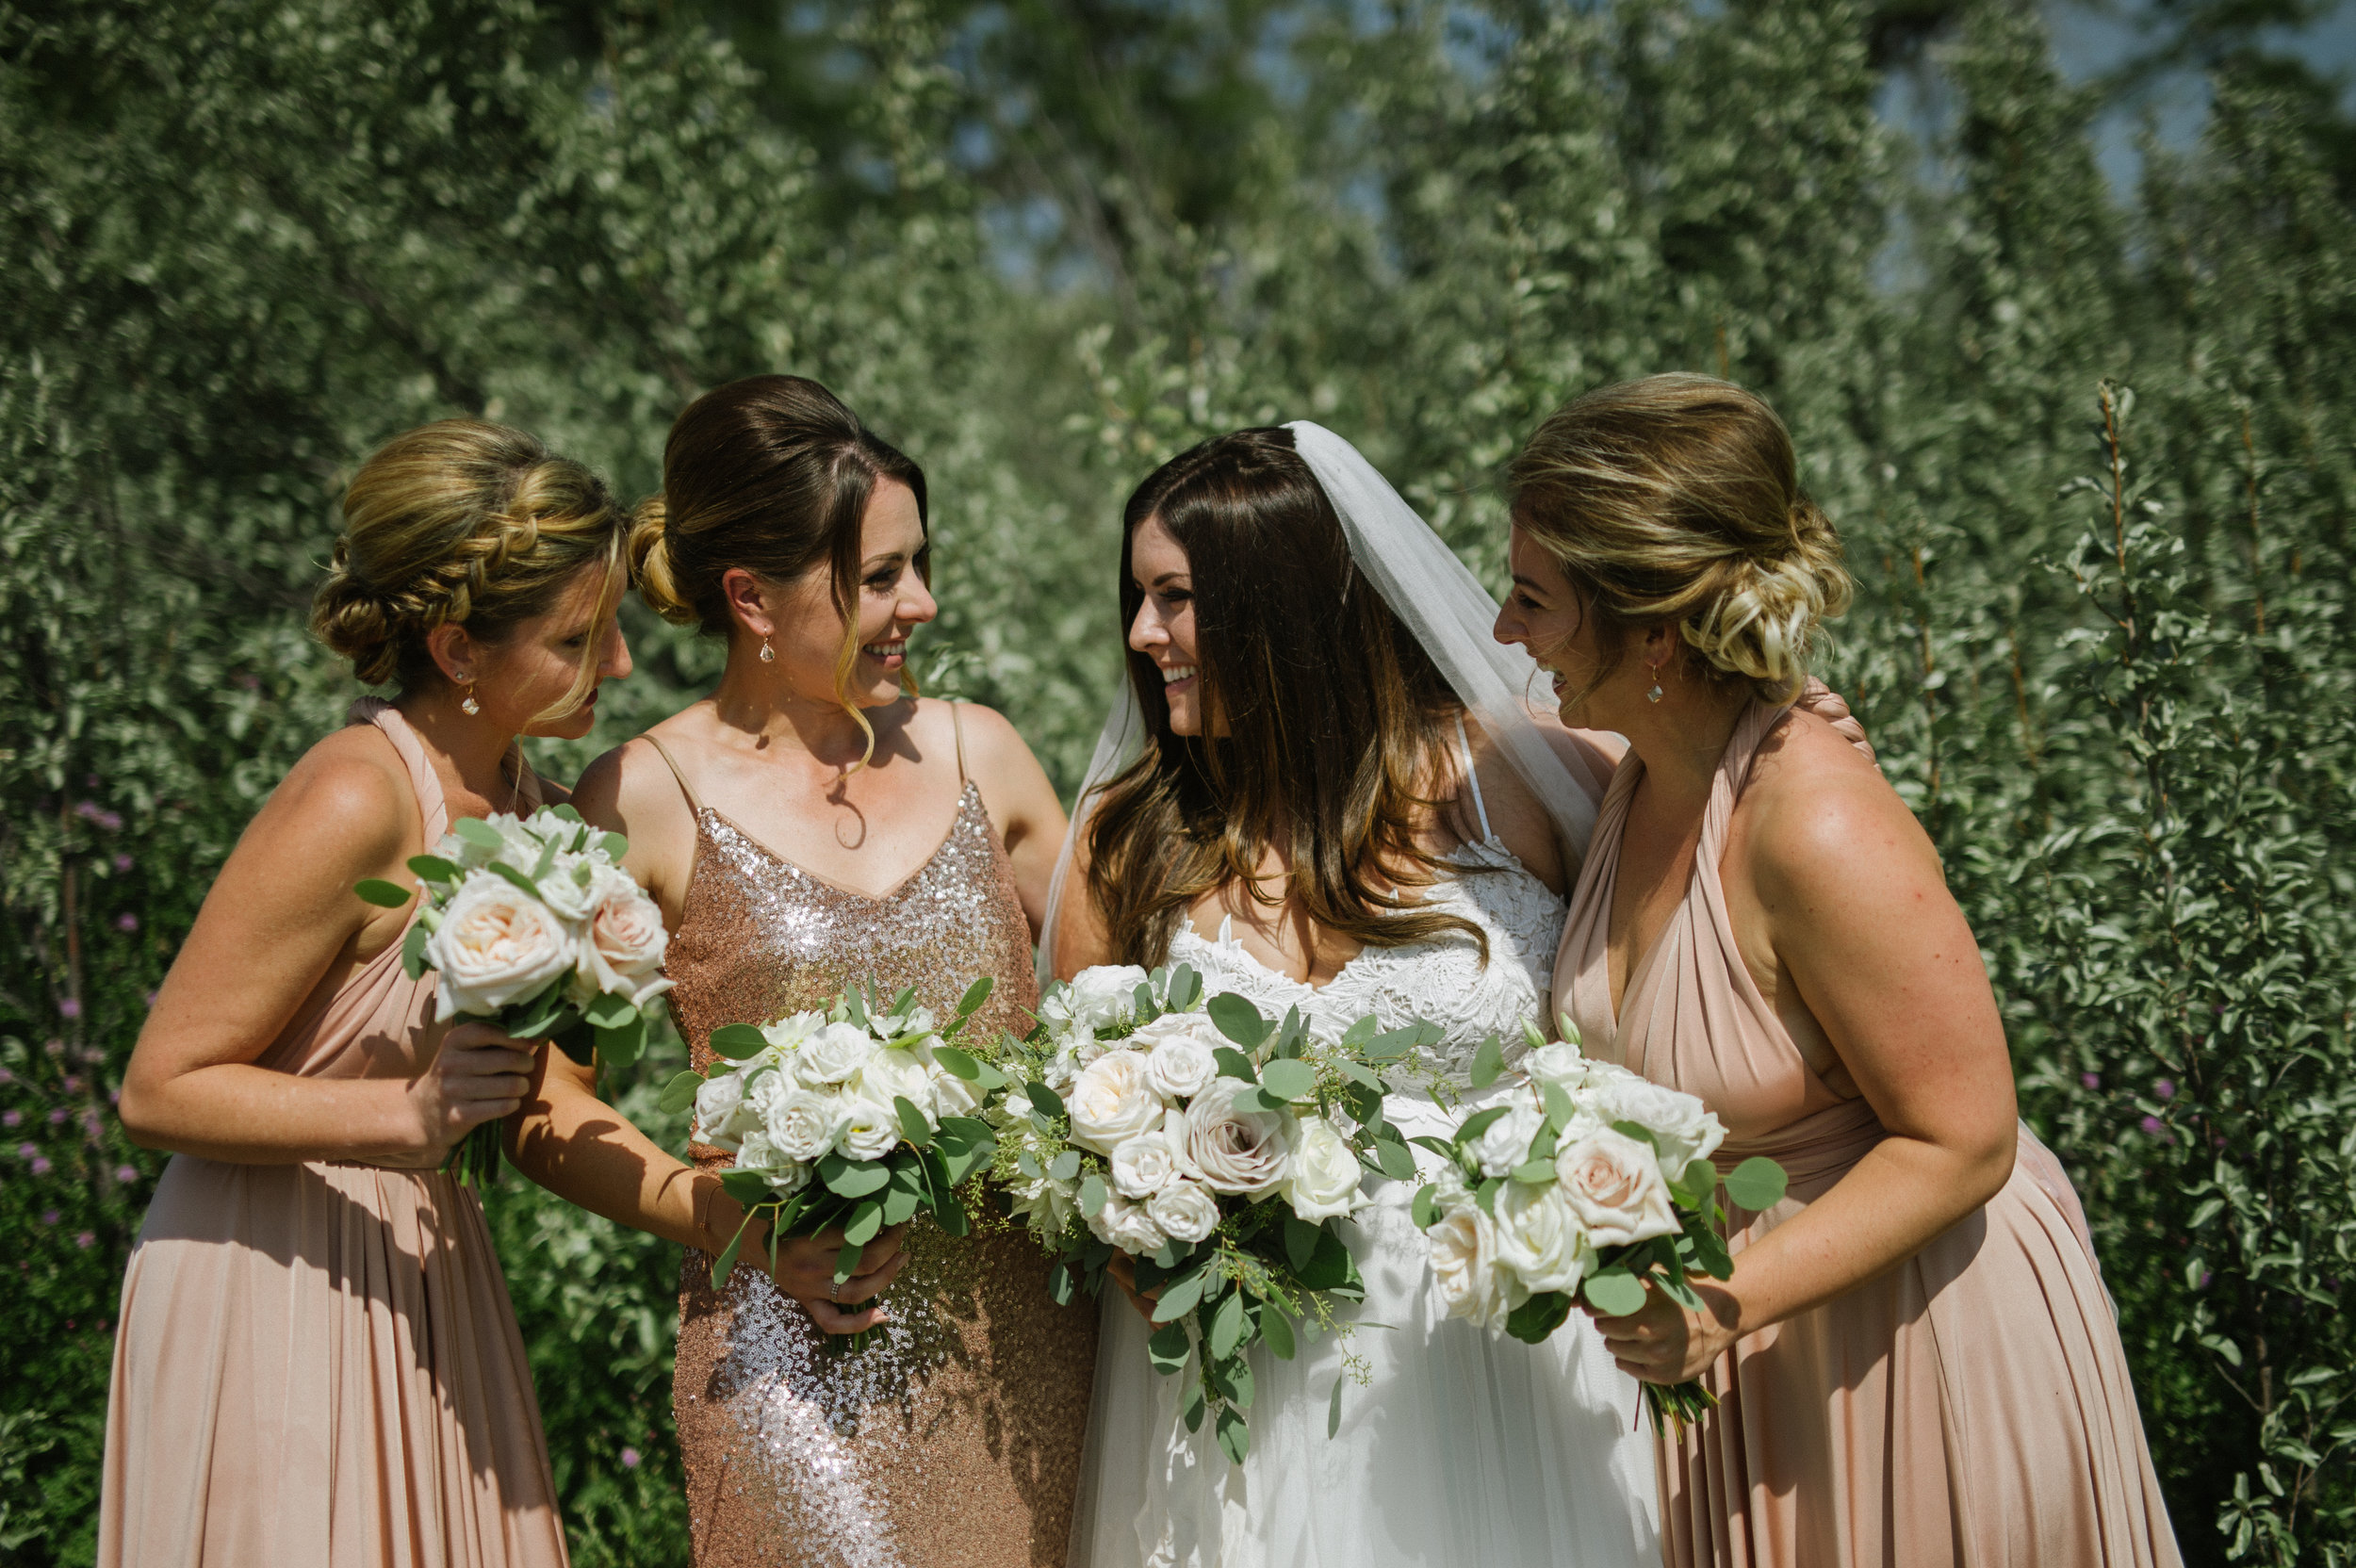 Calgary_Wedding_Photography_Lake_House_Weddings_Cassandra_Derek_2018_HR005.jpg